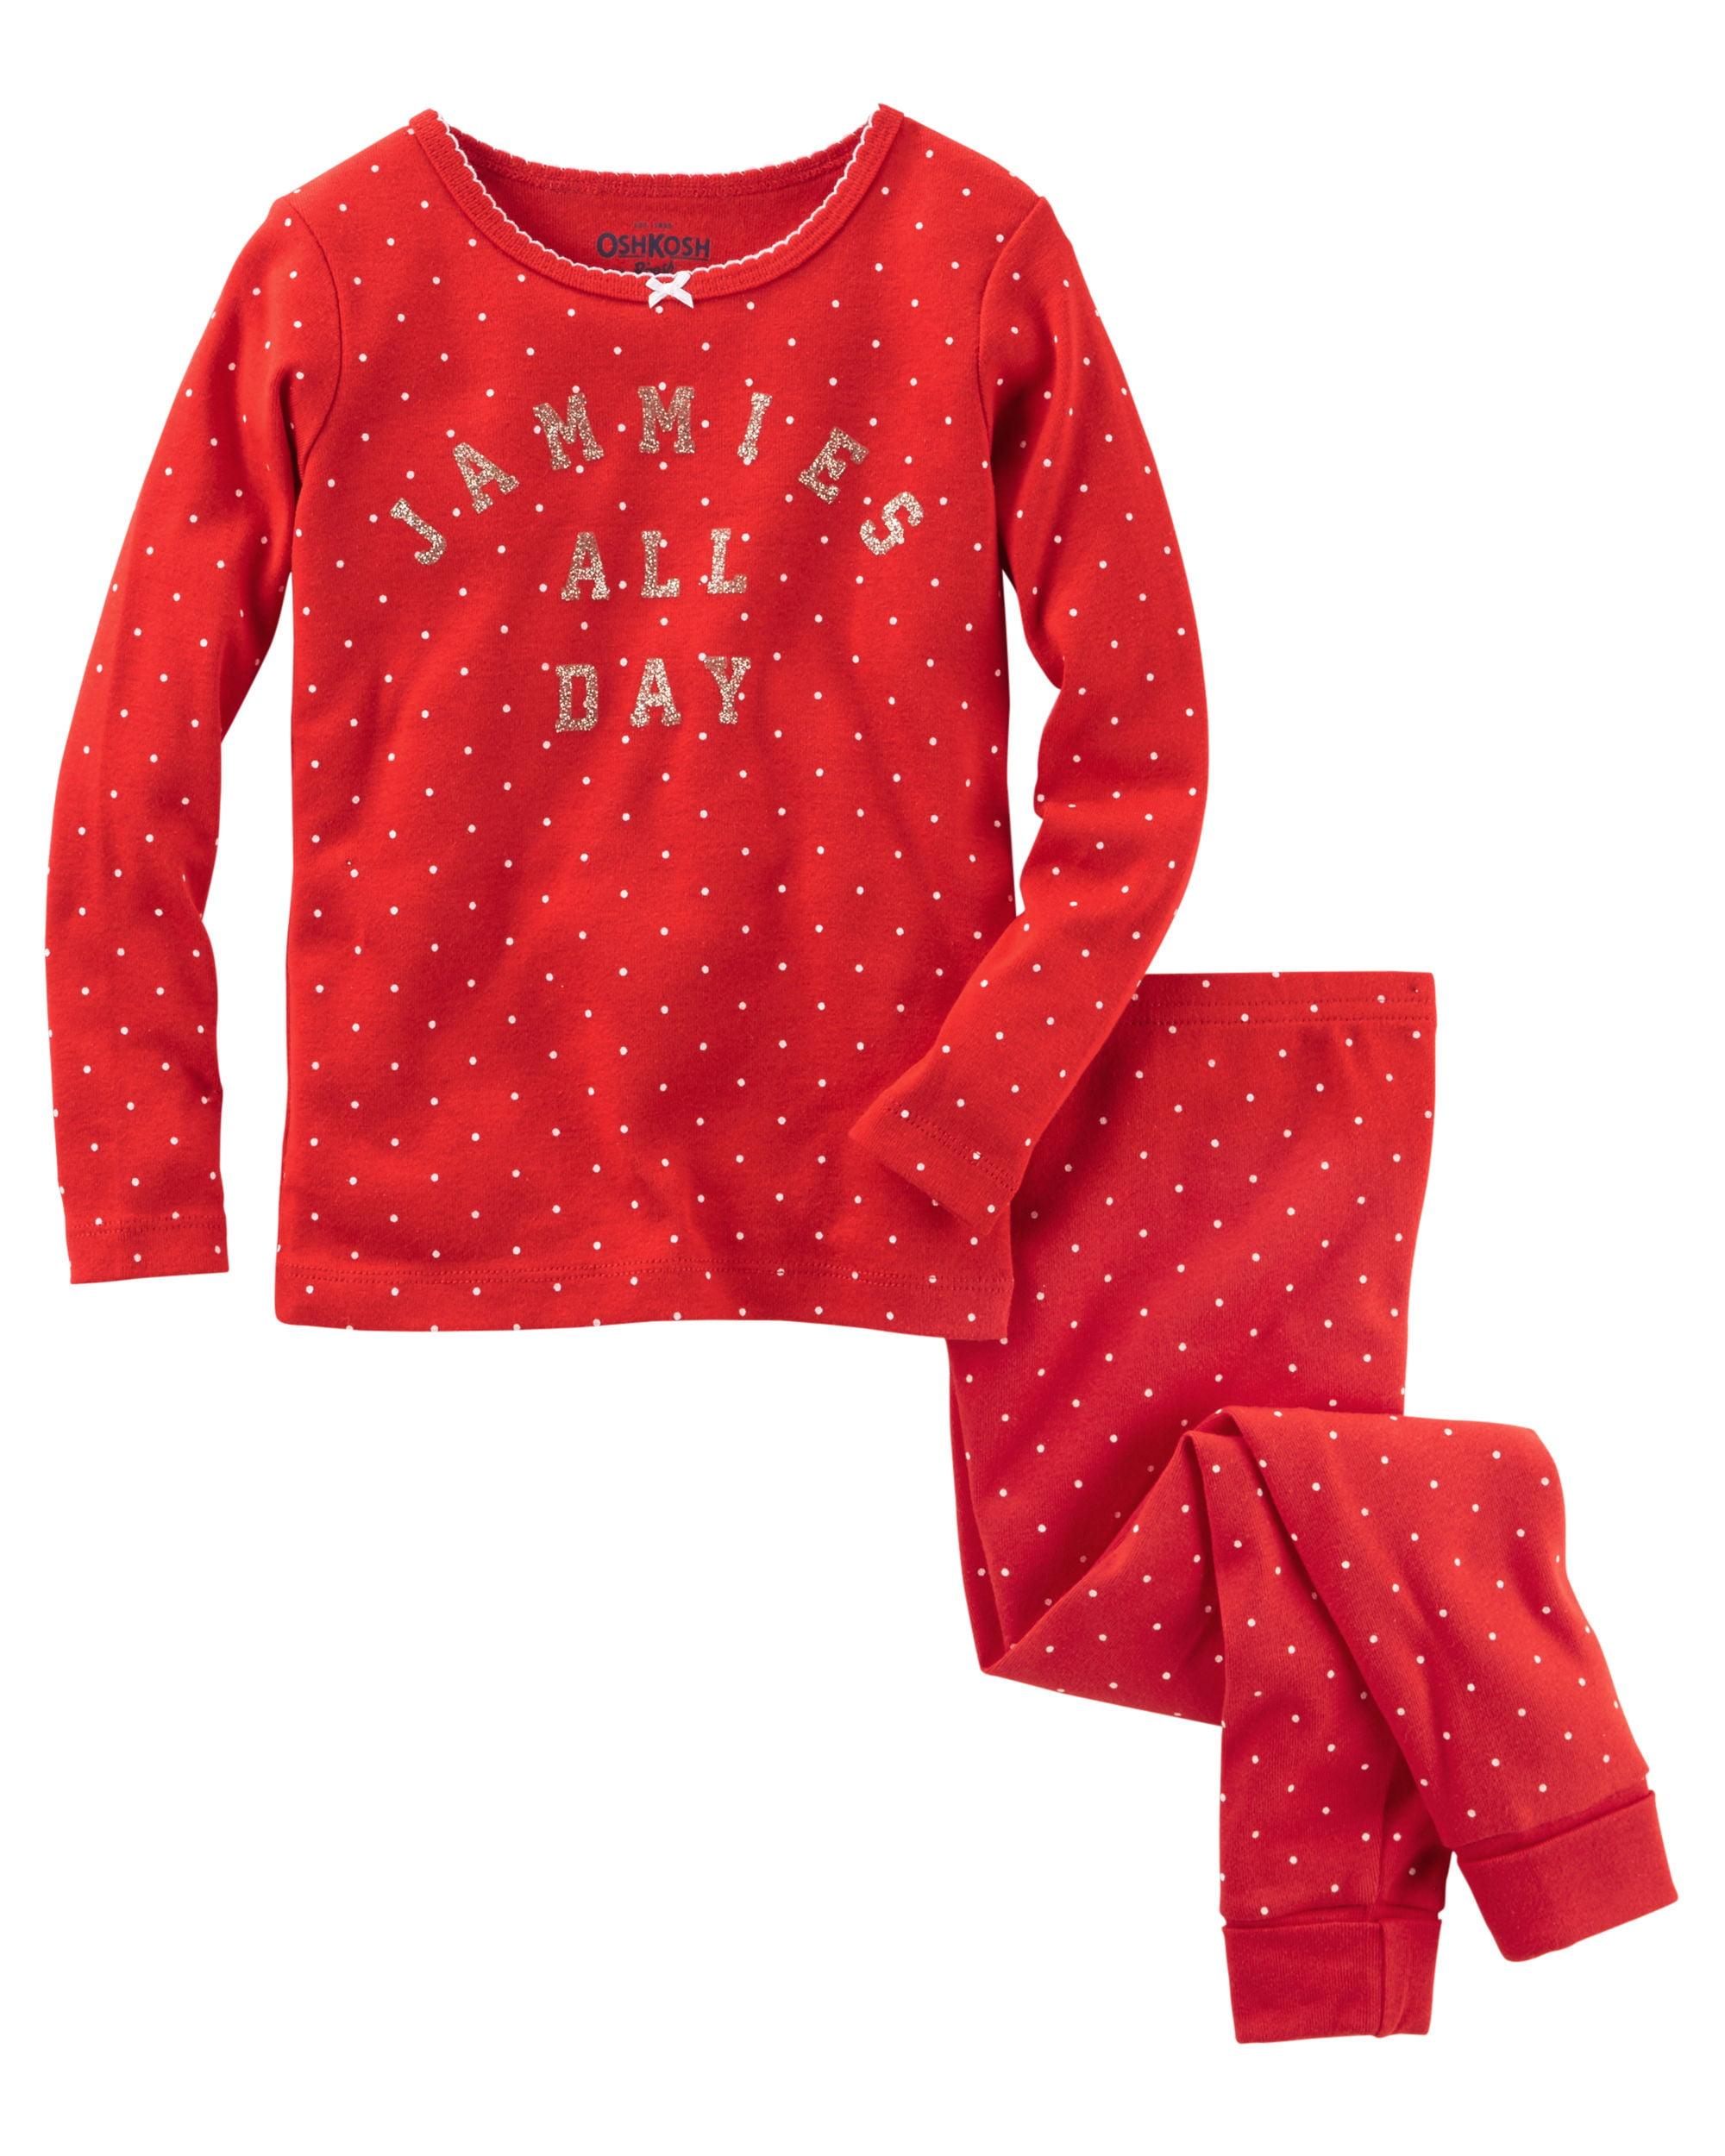 OshKosh B'gosh Little Girls' 2 Pc Sparkle Jammies All Day Pajama Set, 3-Todder